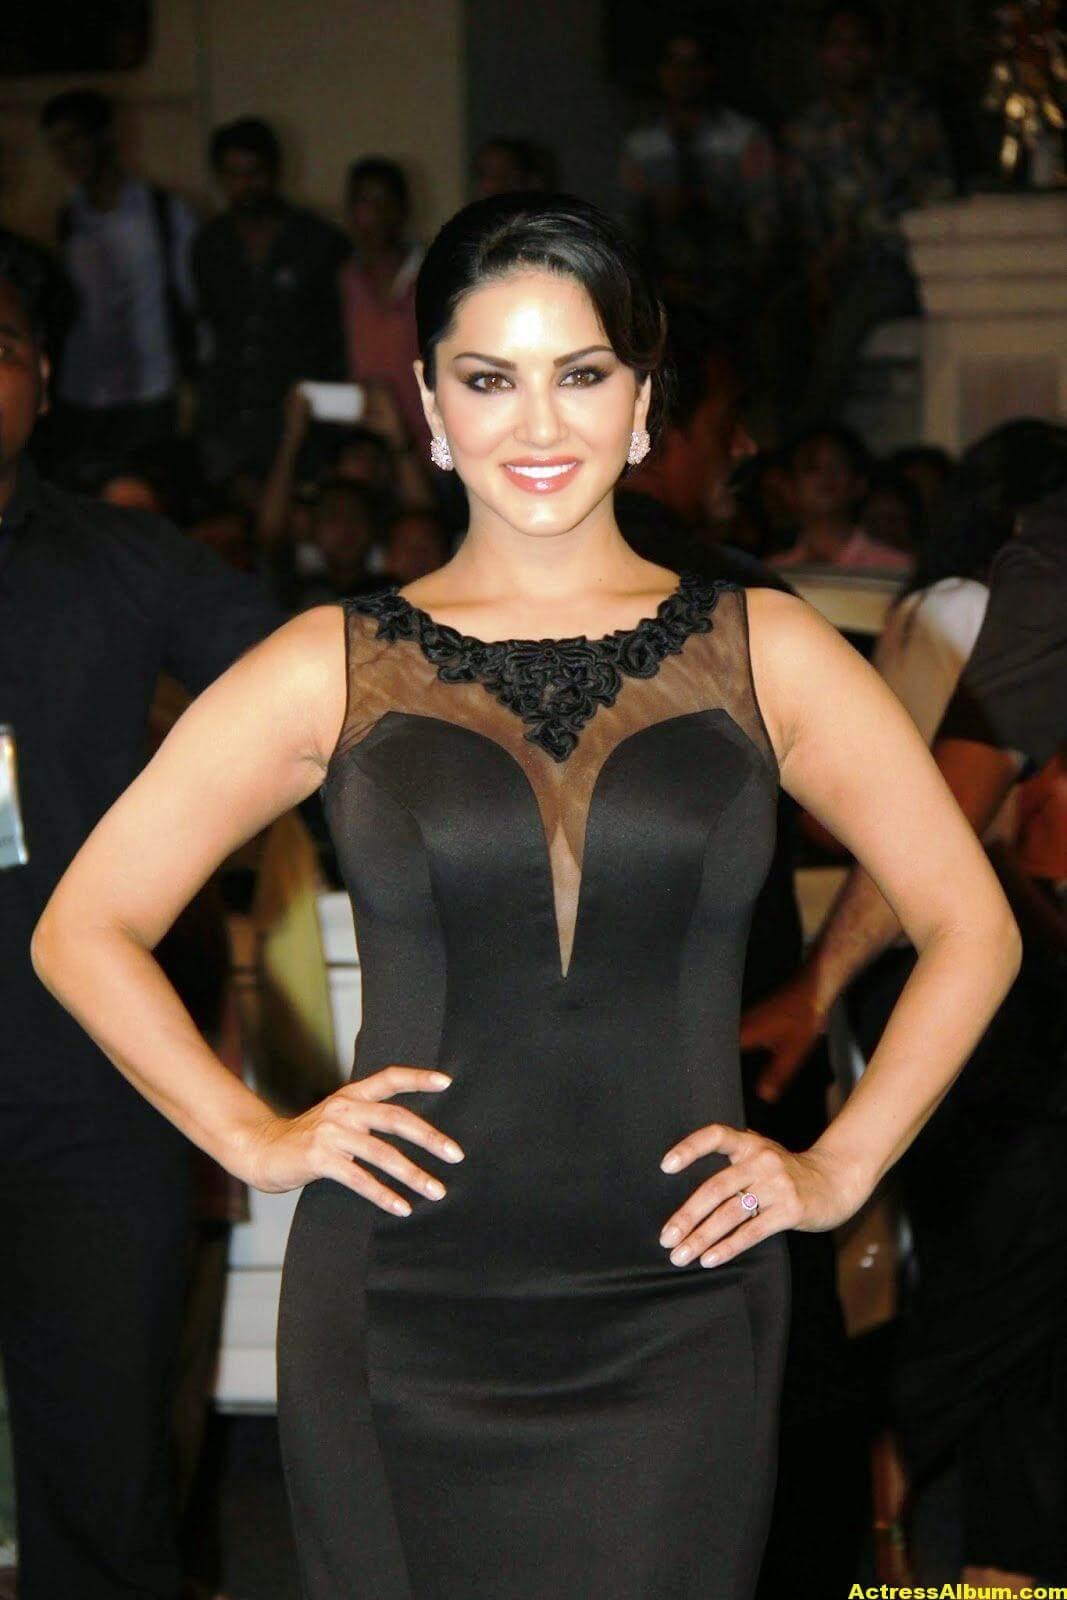 Sunny Leone Hot Photos In Black Dress - Actress Album-5944